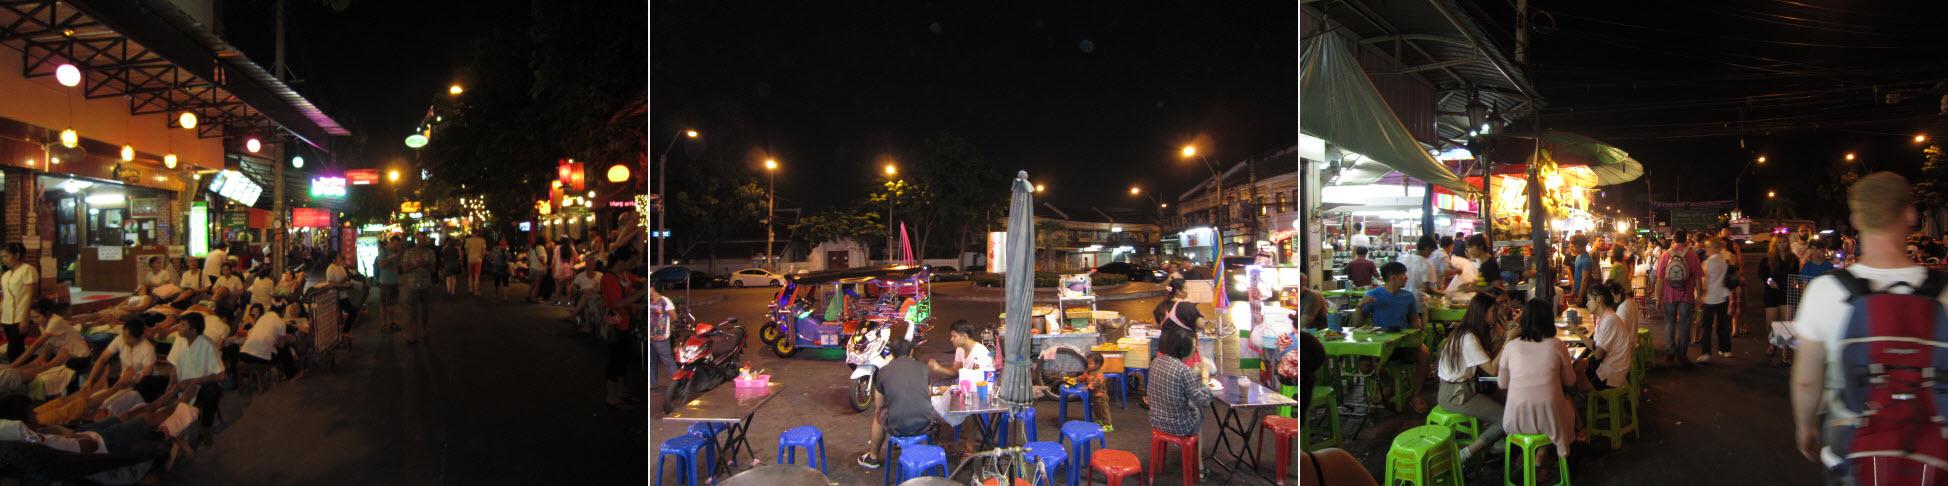 khao-san-road-thailand-impressionen